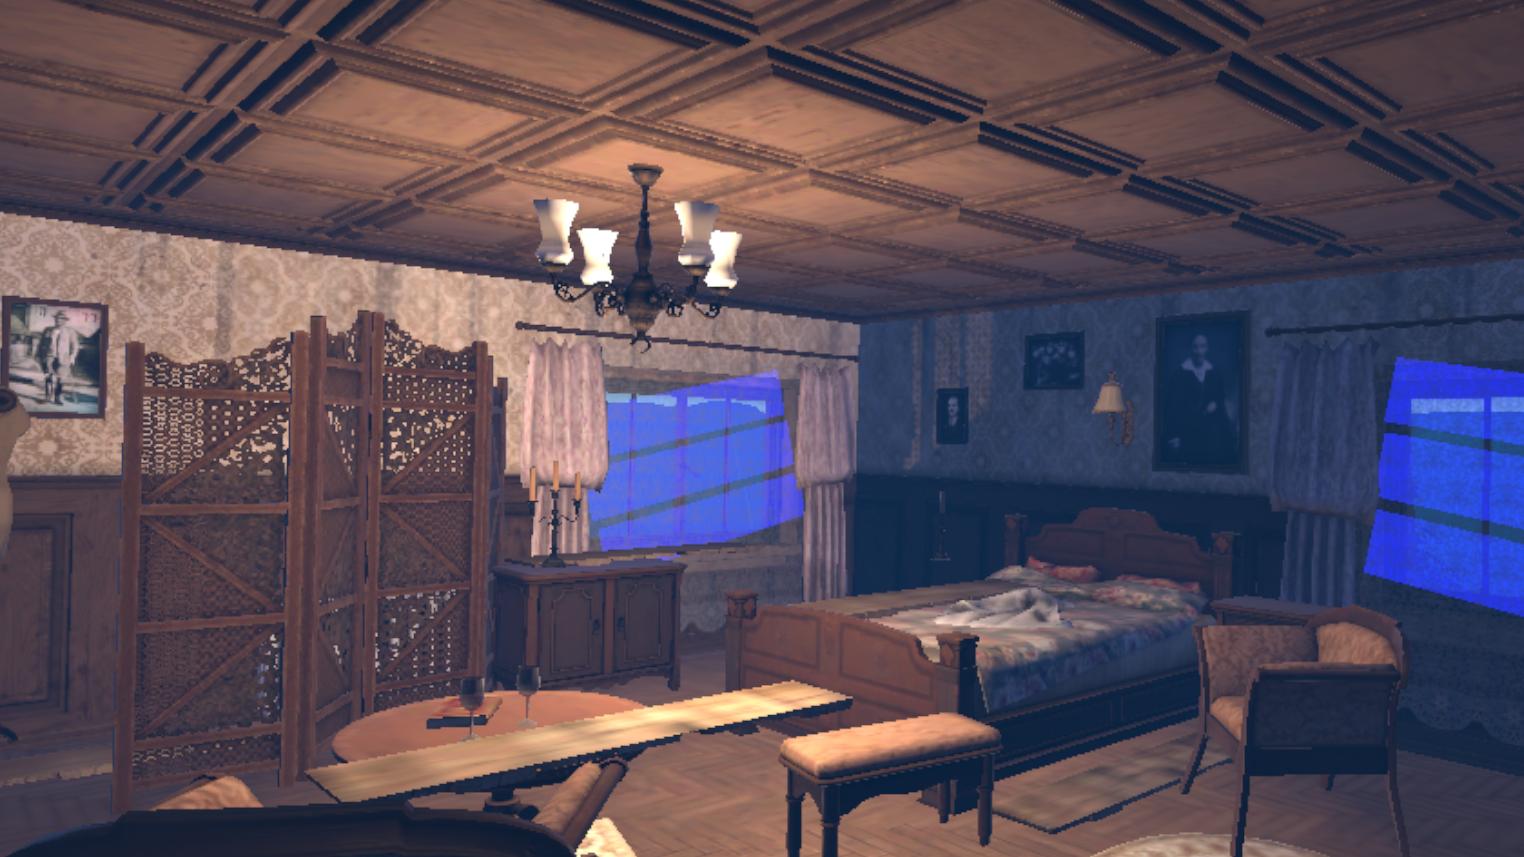 Historic VR reconstruction of WW2 blitz London house